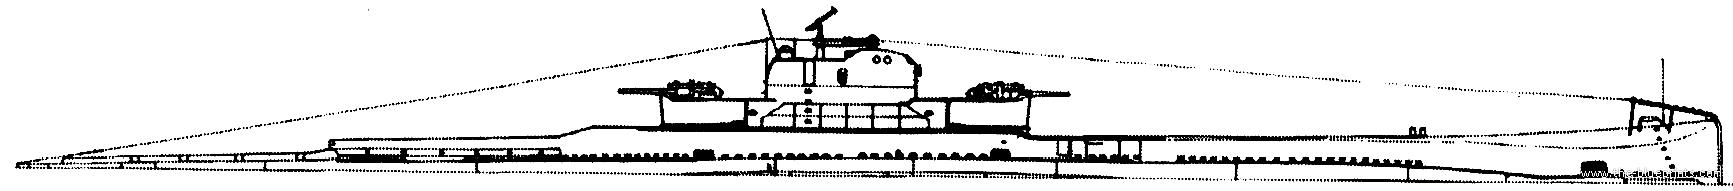 [Слика: jrm-nebojsa-1941-submarine-yugoslavia.png]